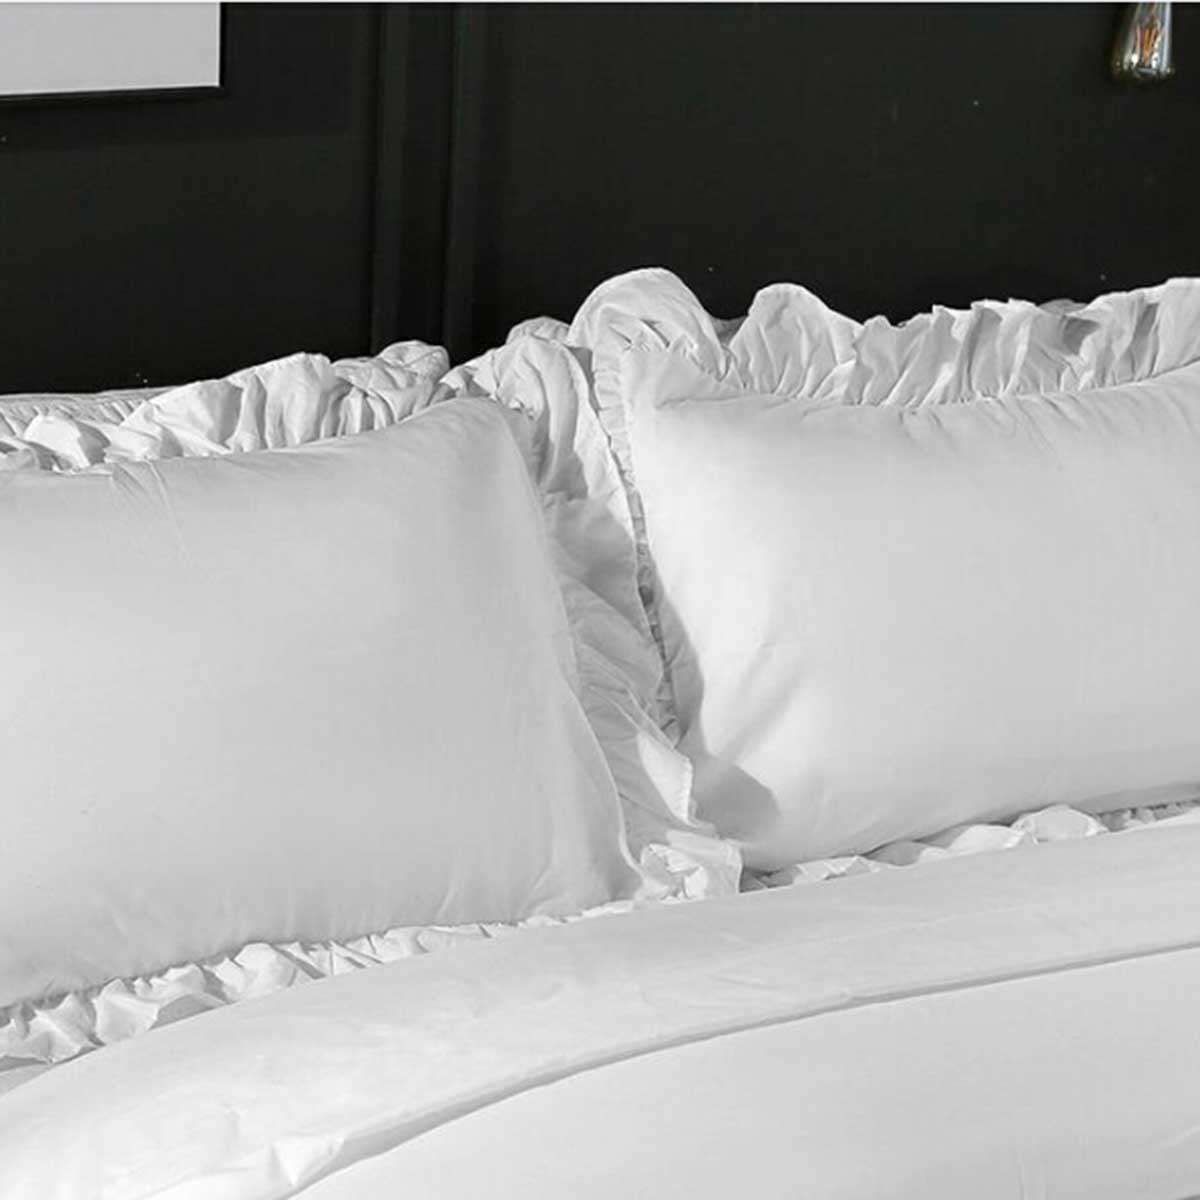 Multicolor Carolines Treasures BB7583PILLOWCASE Welcome Friends Black White Collie Fabric Standard Pillowcase Standard